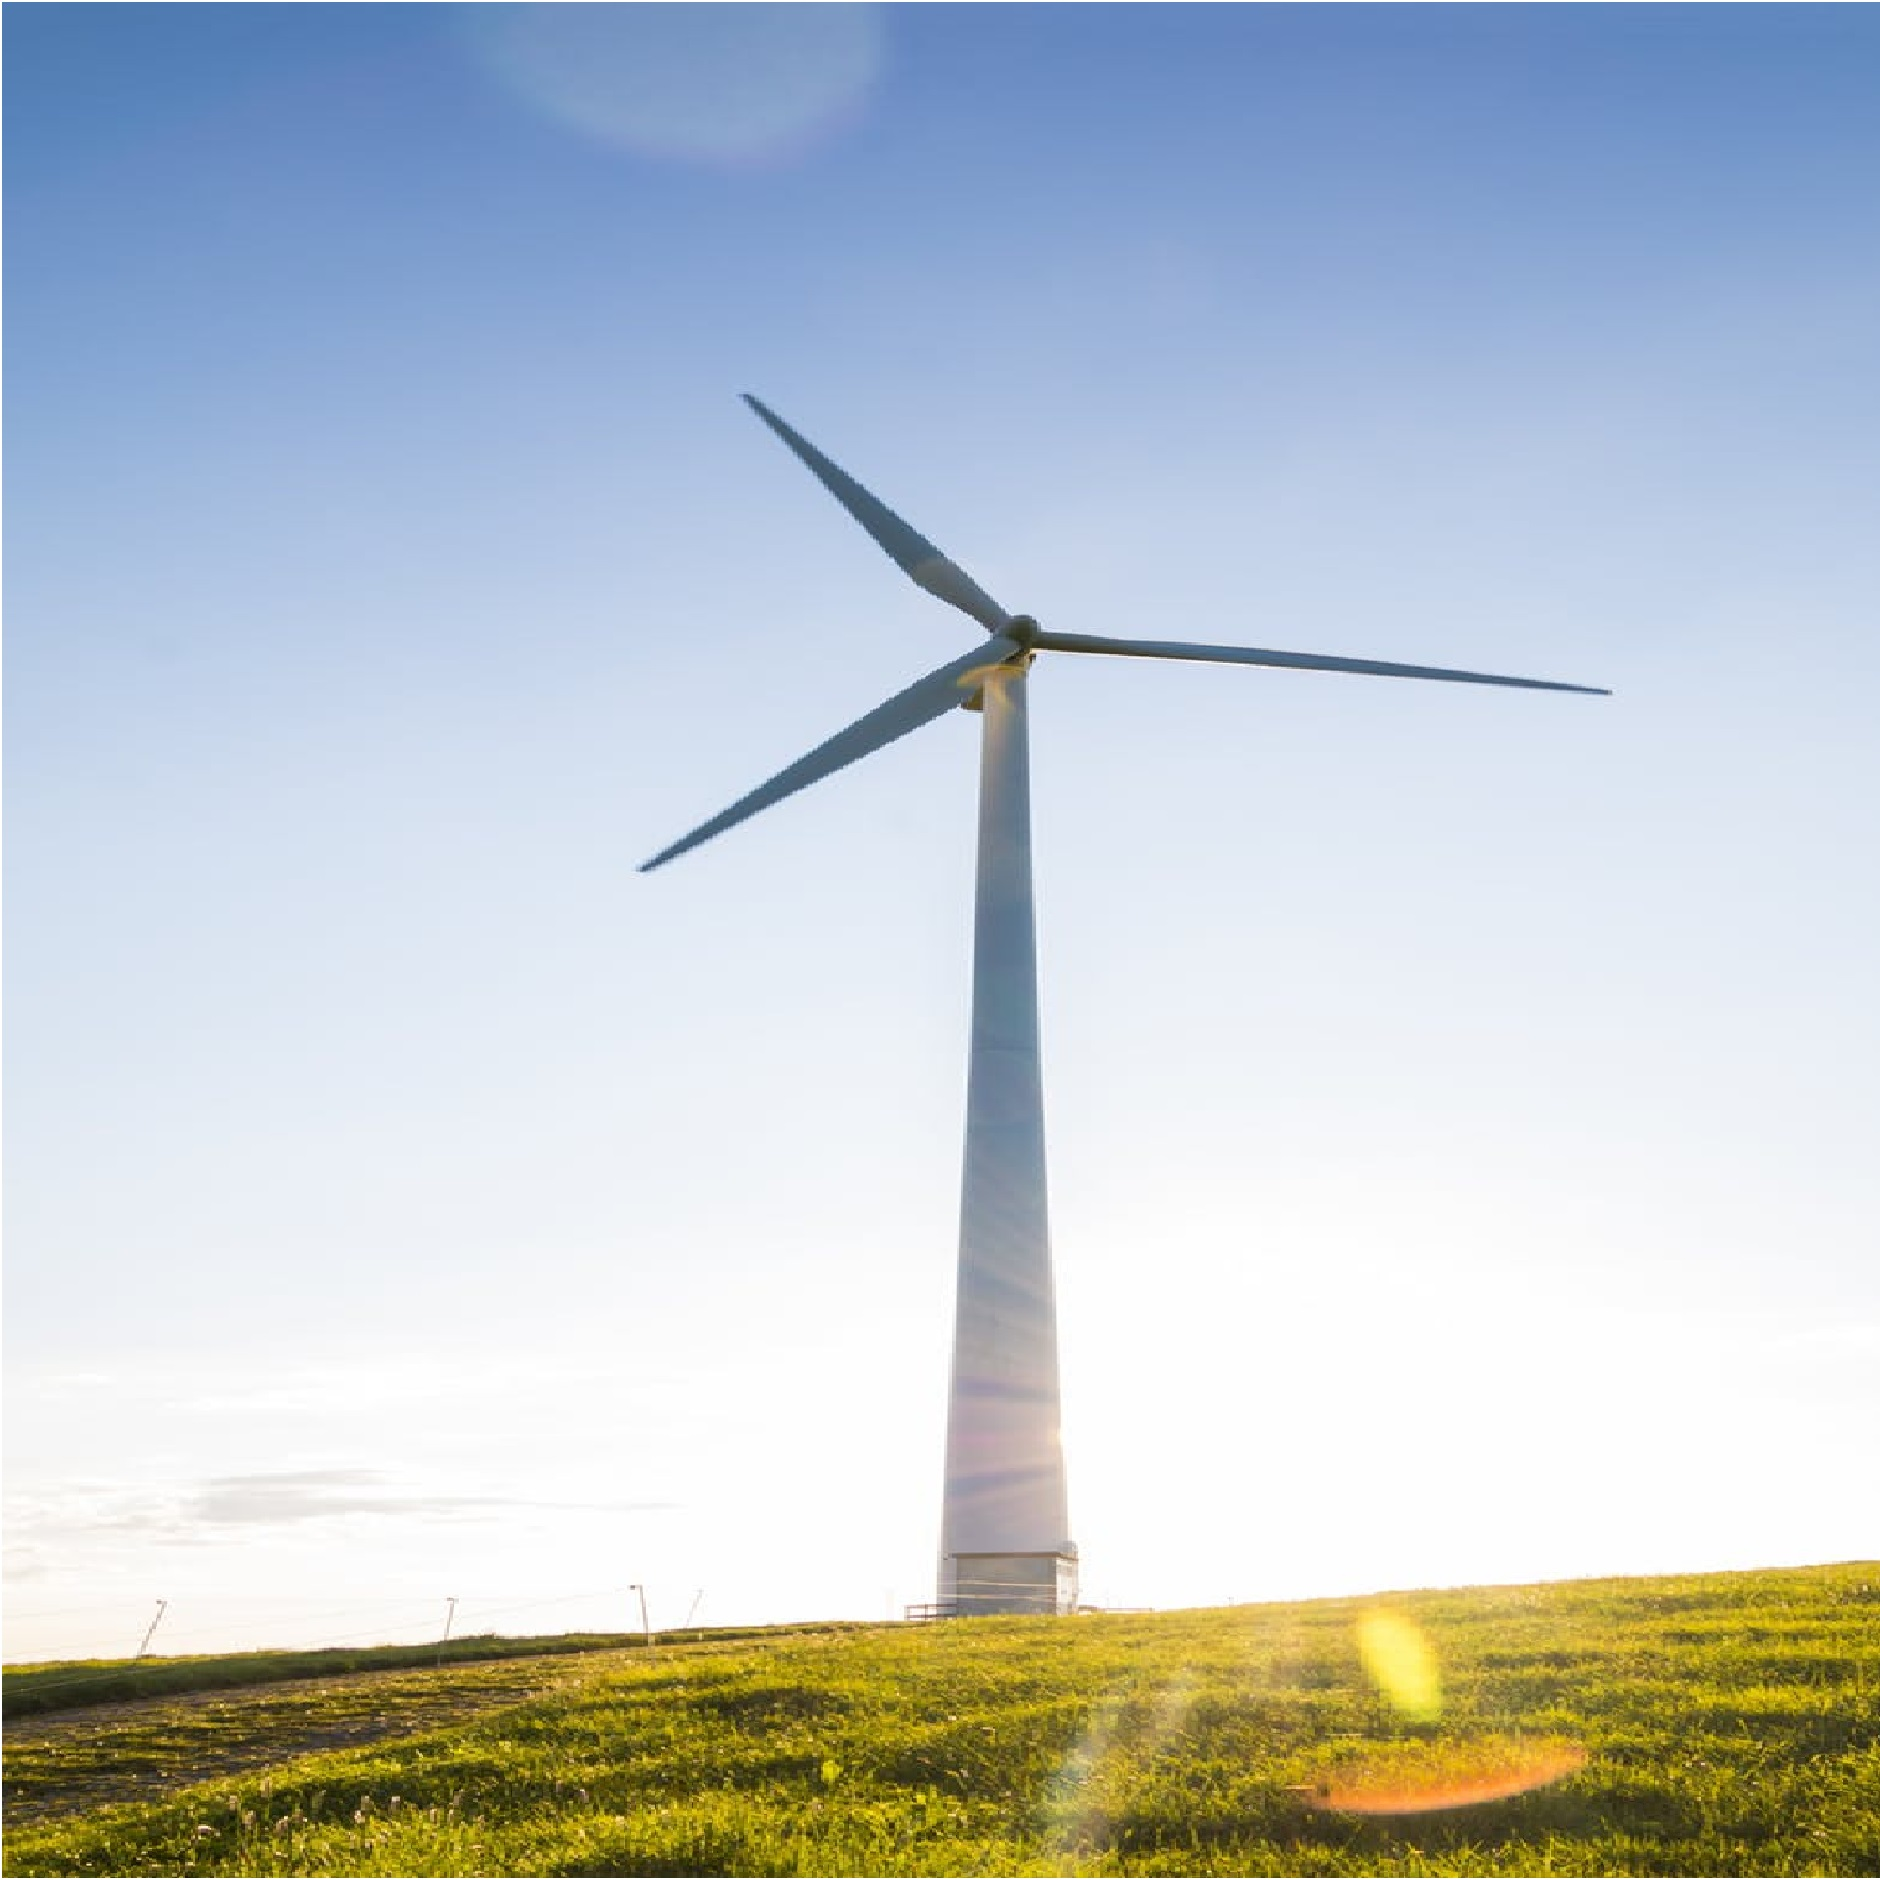 RES&EM ICT Tools- Surse noi de energie si managementul protectiei mediului prin instrumente IT